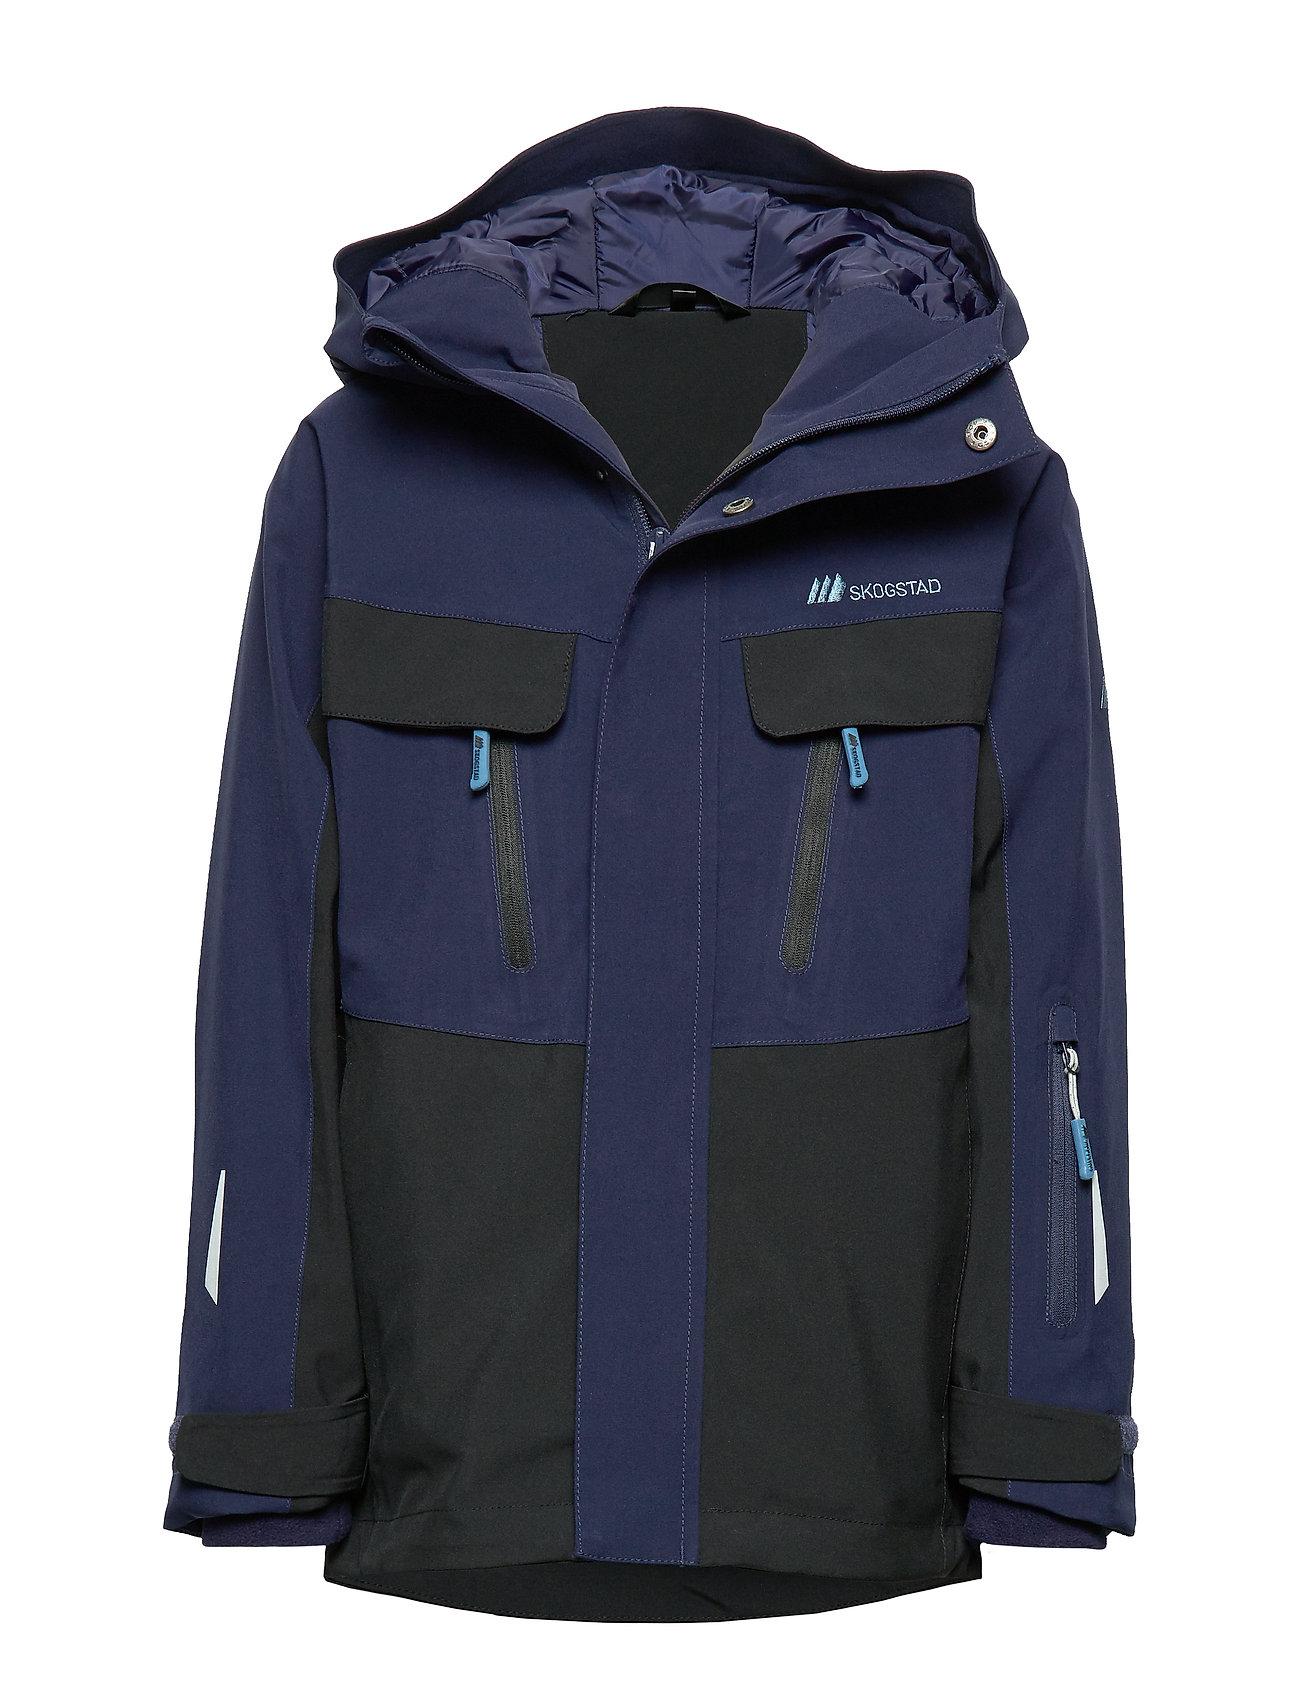 Skogstad Espeåpsen 2-Layer Technical  Jacket - BLACK